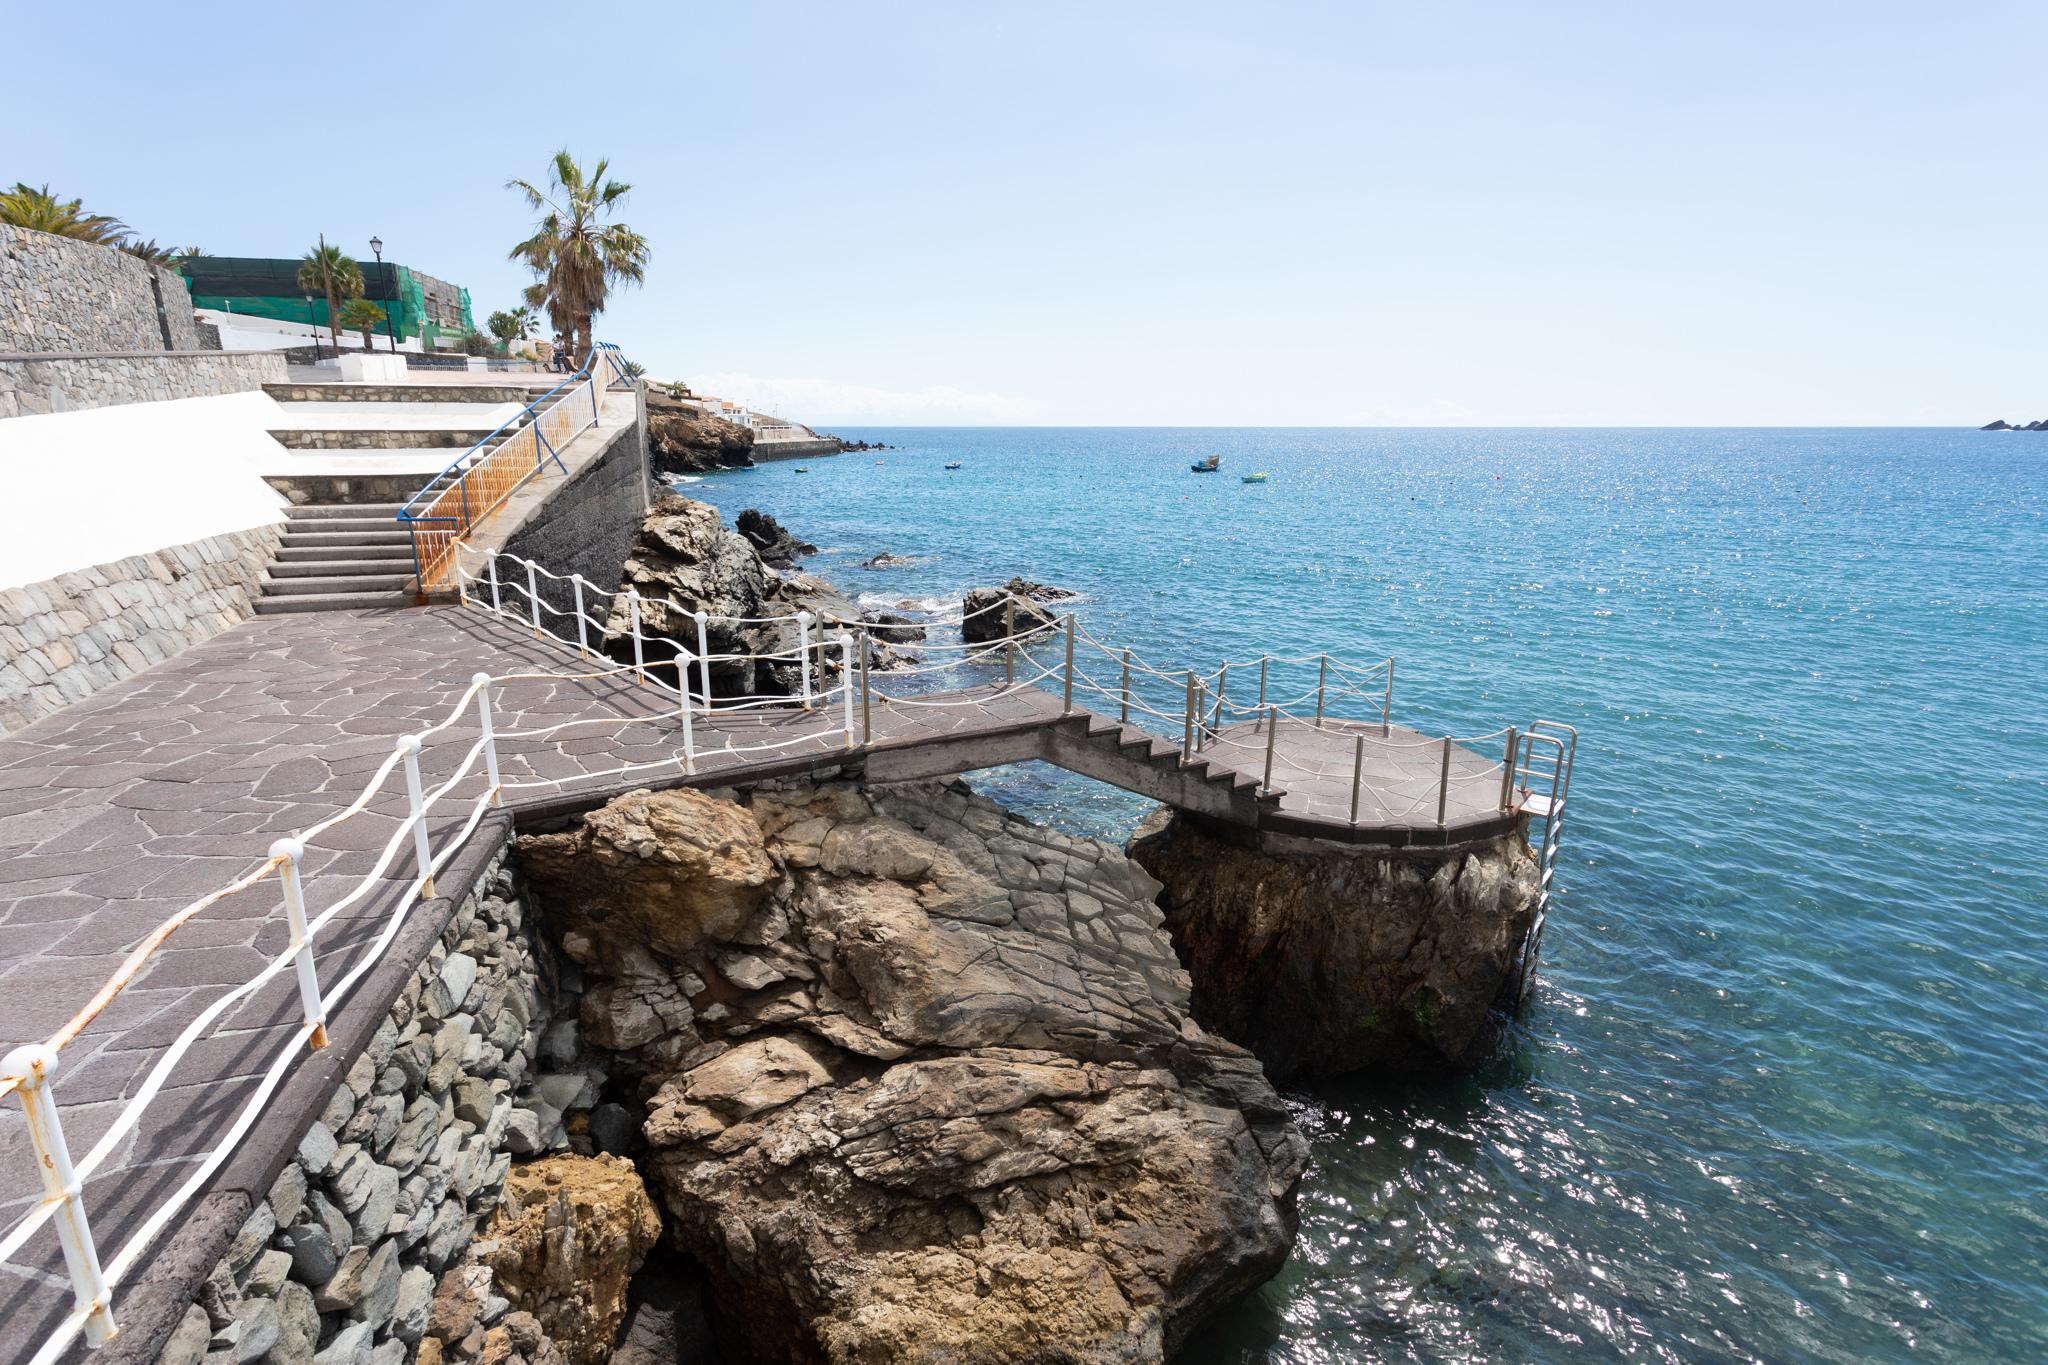 Holiday house direkt am Meer mit eigenem Pool (1671160), Poris de Abona, Tenerife, Canary Islands, Spain, picture 47